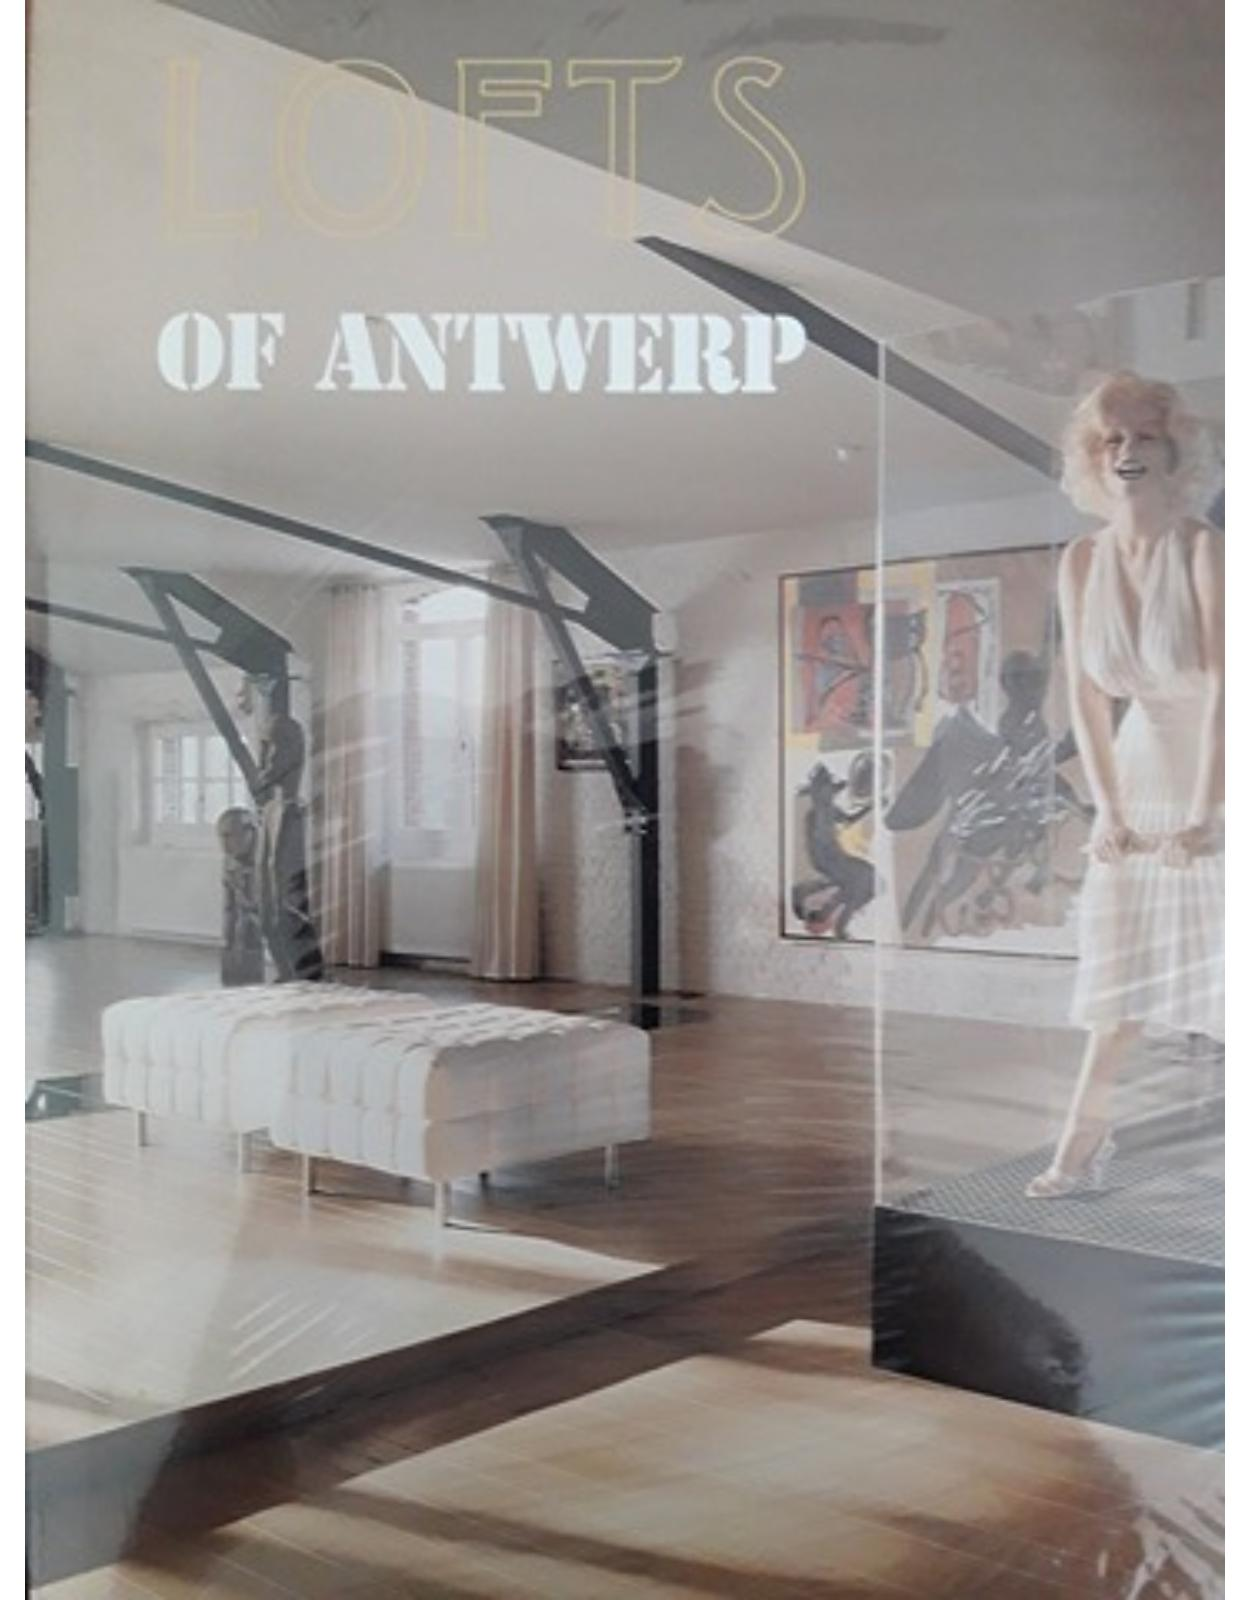 Lofts of Antwerp